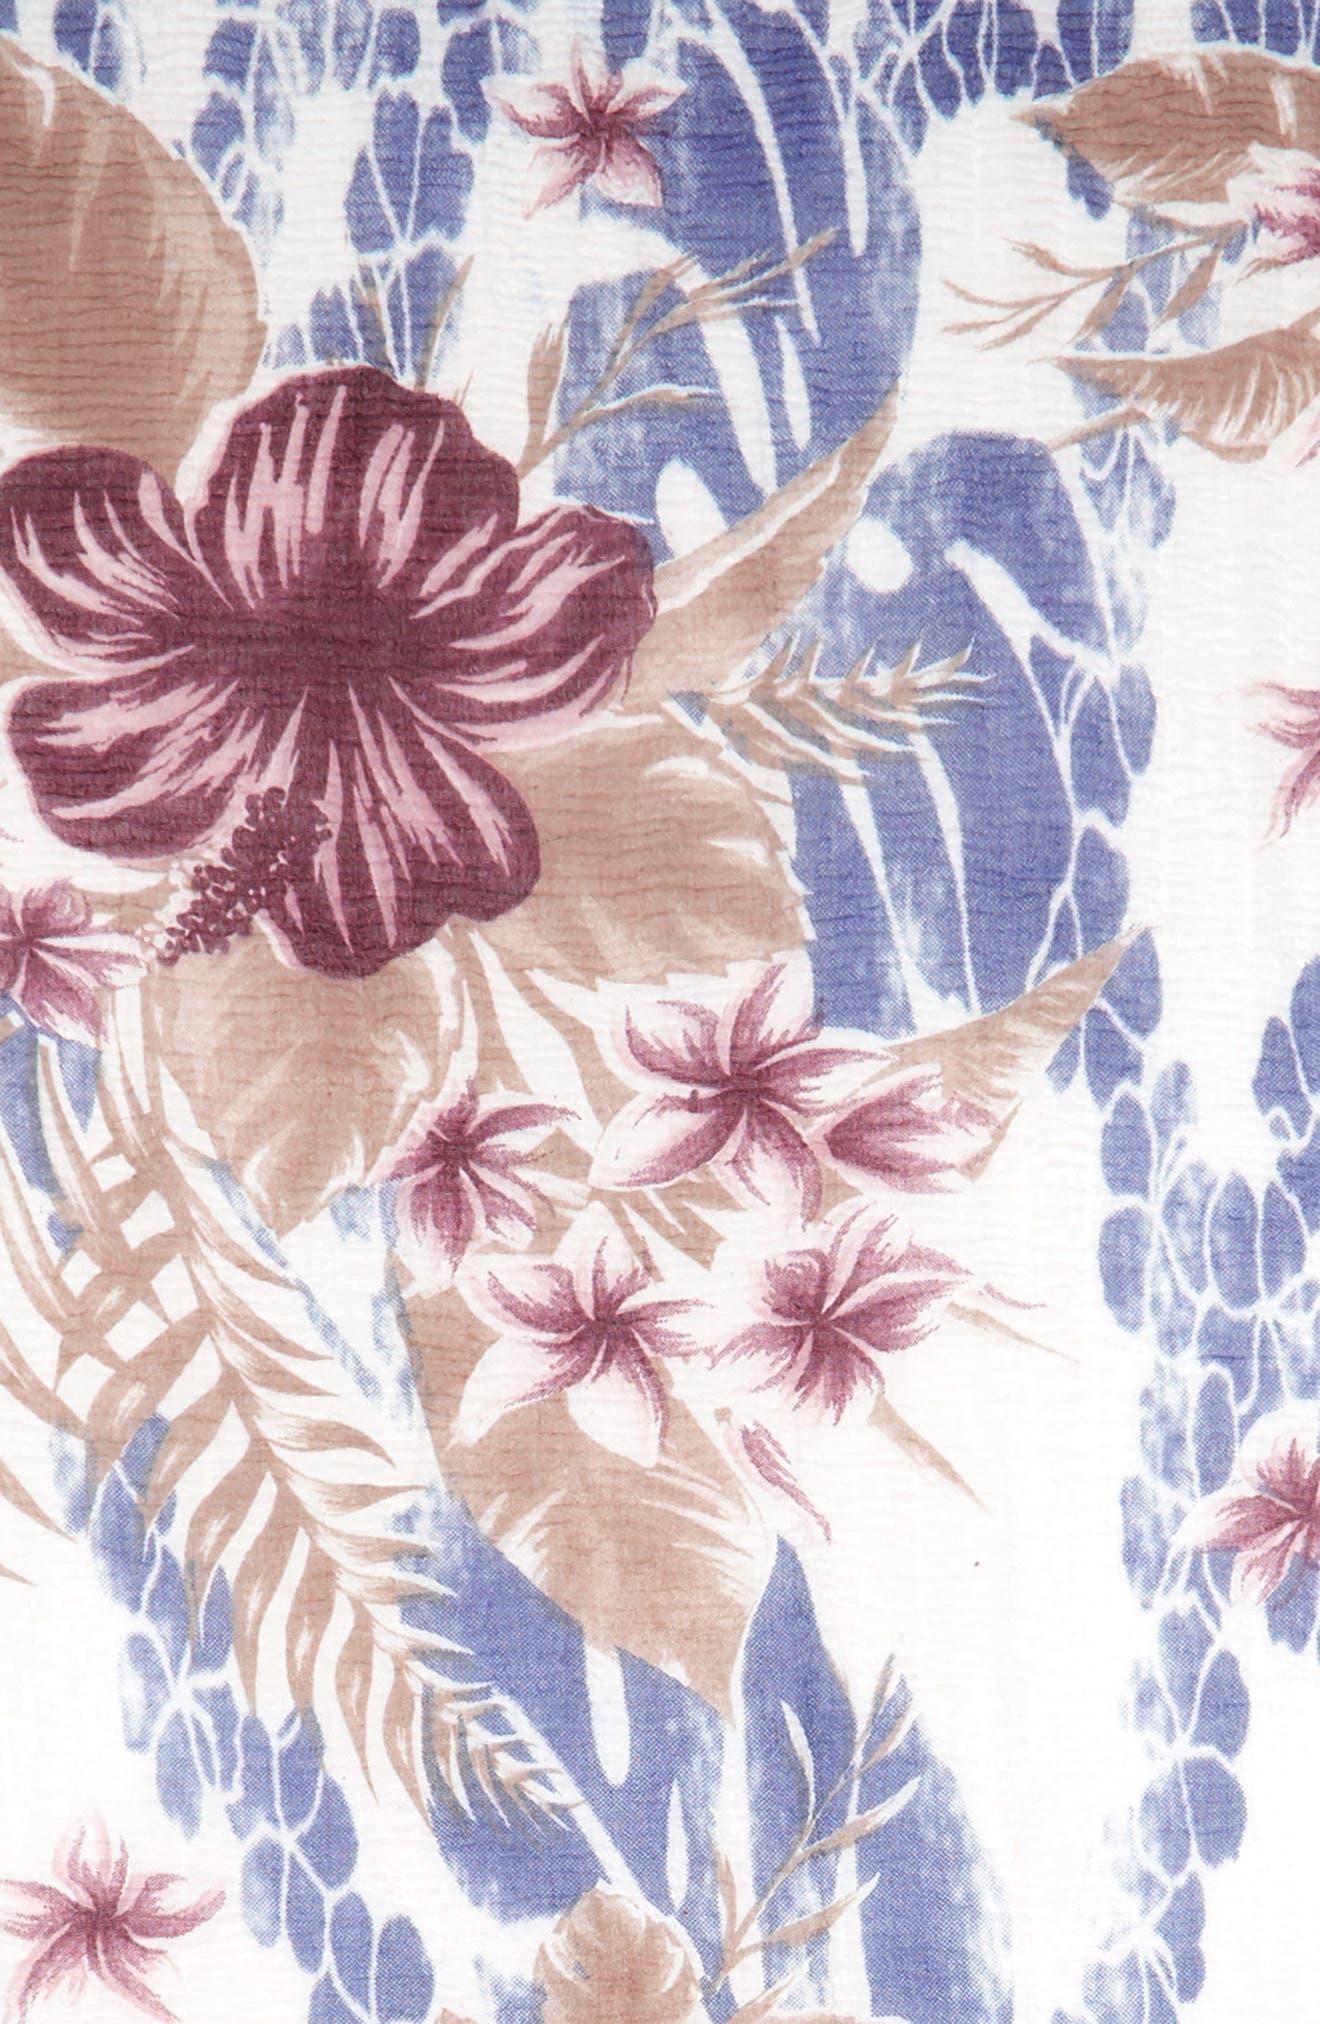 Bahama Floral Print Scarf,                             Alternate thumbnail 3, color,                             Multi